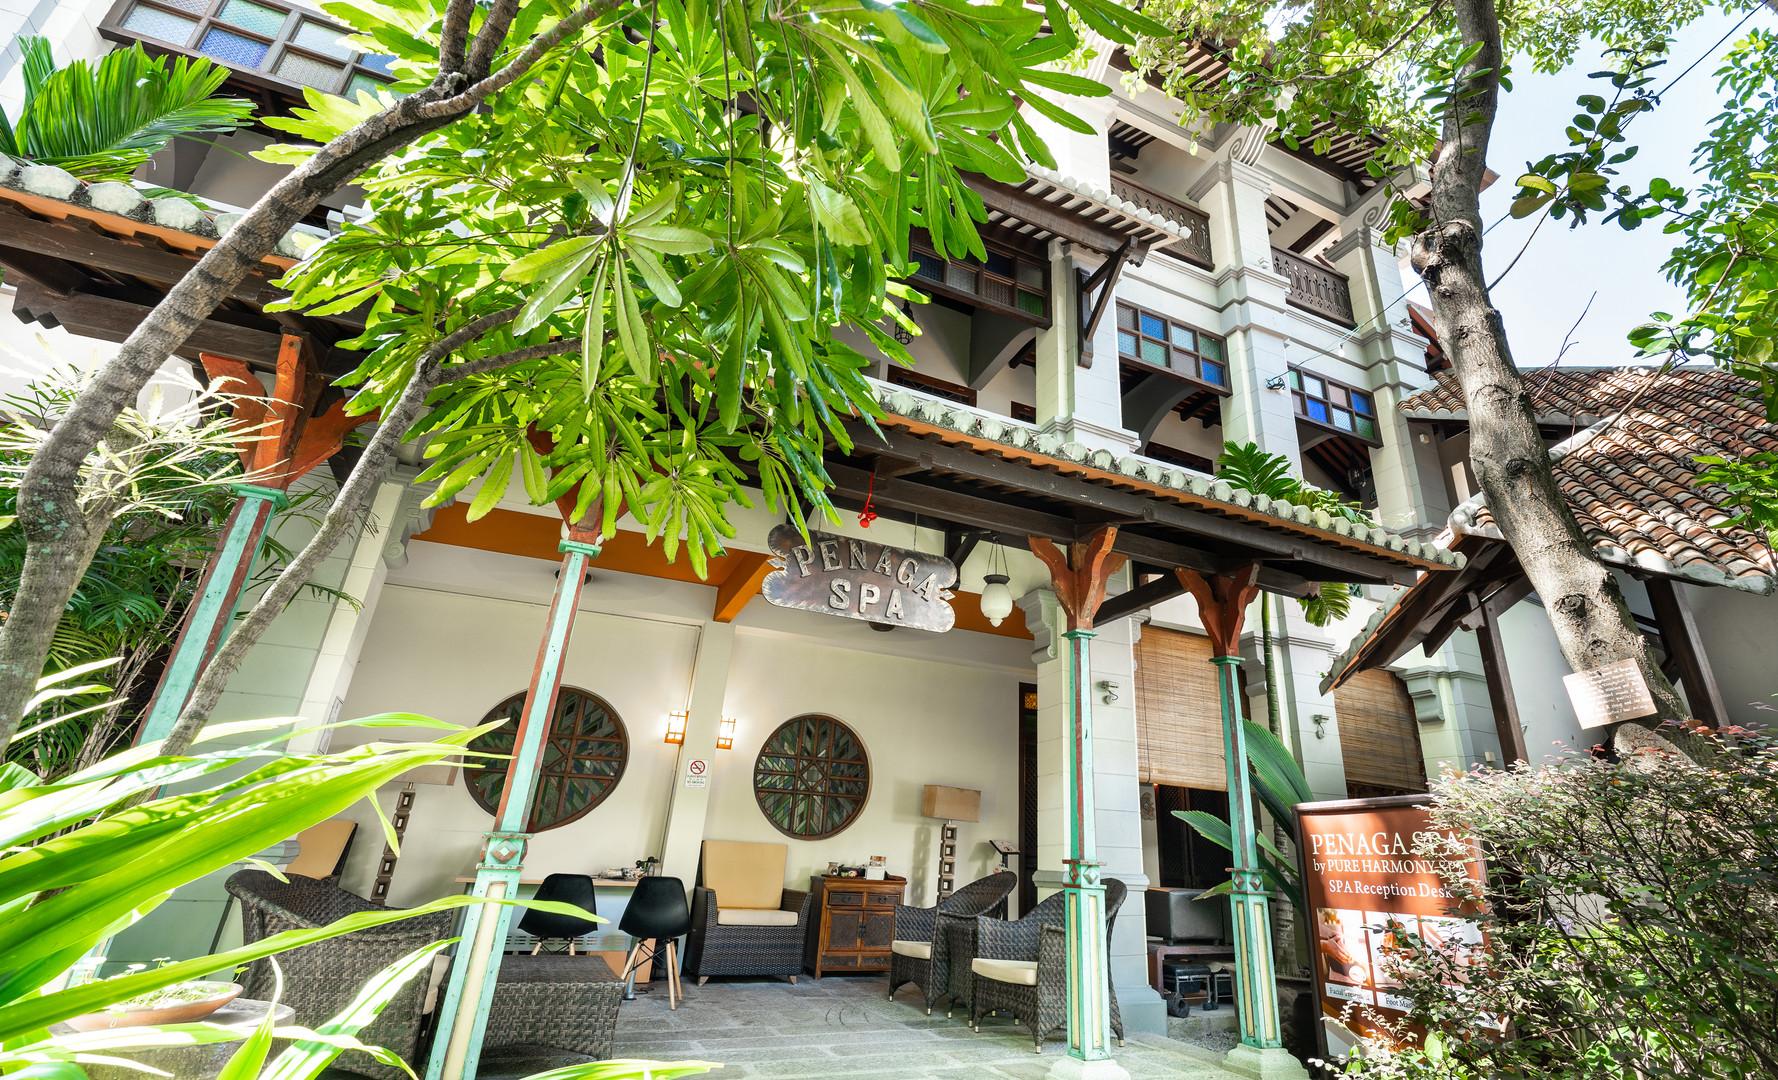 Hotel Penaga - Penaga Spa Building